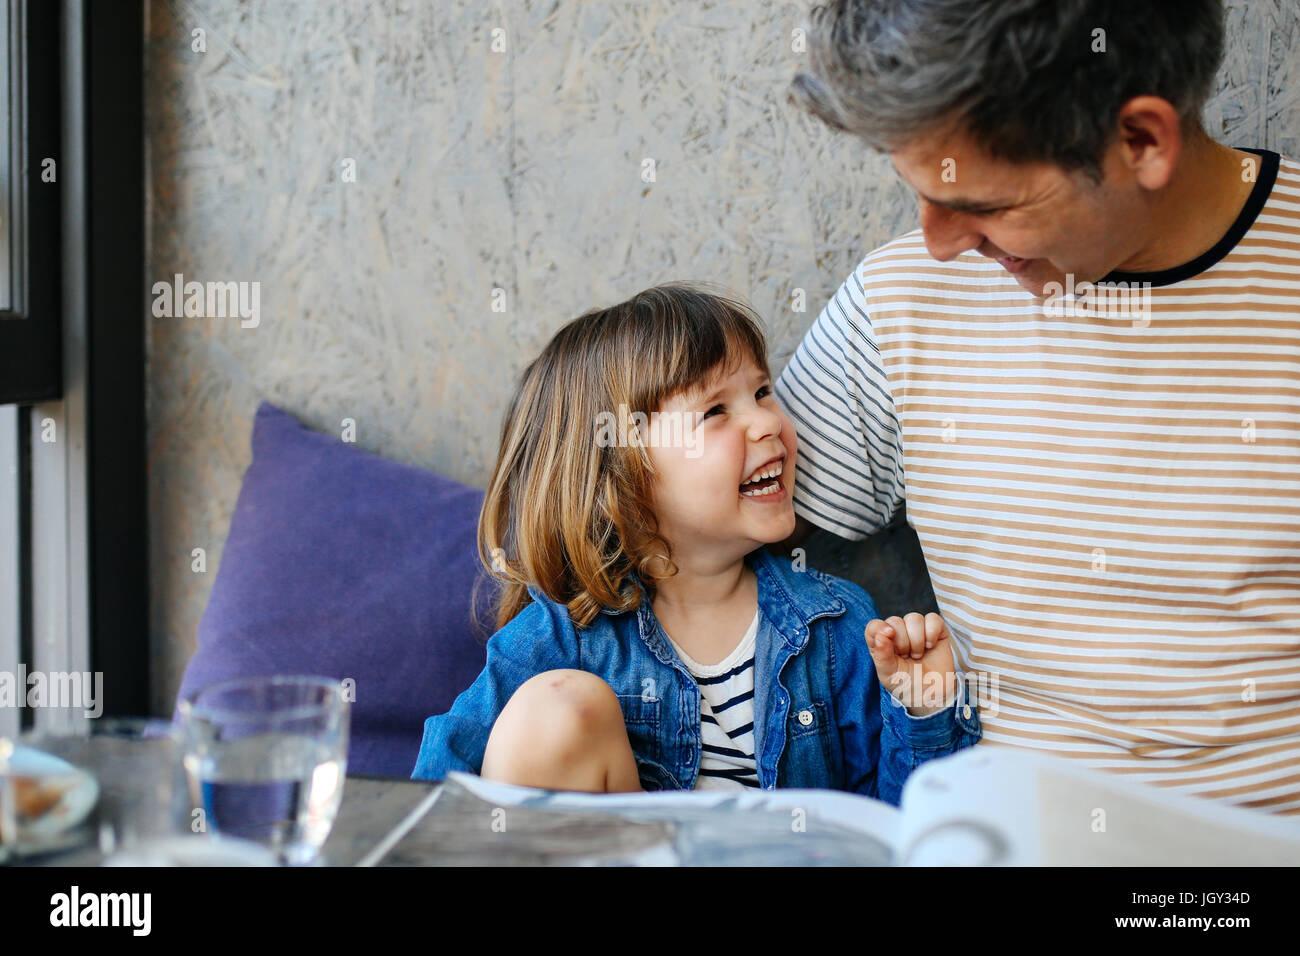 Mädchen lacht mit Vater im café Stockbild